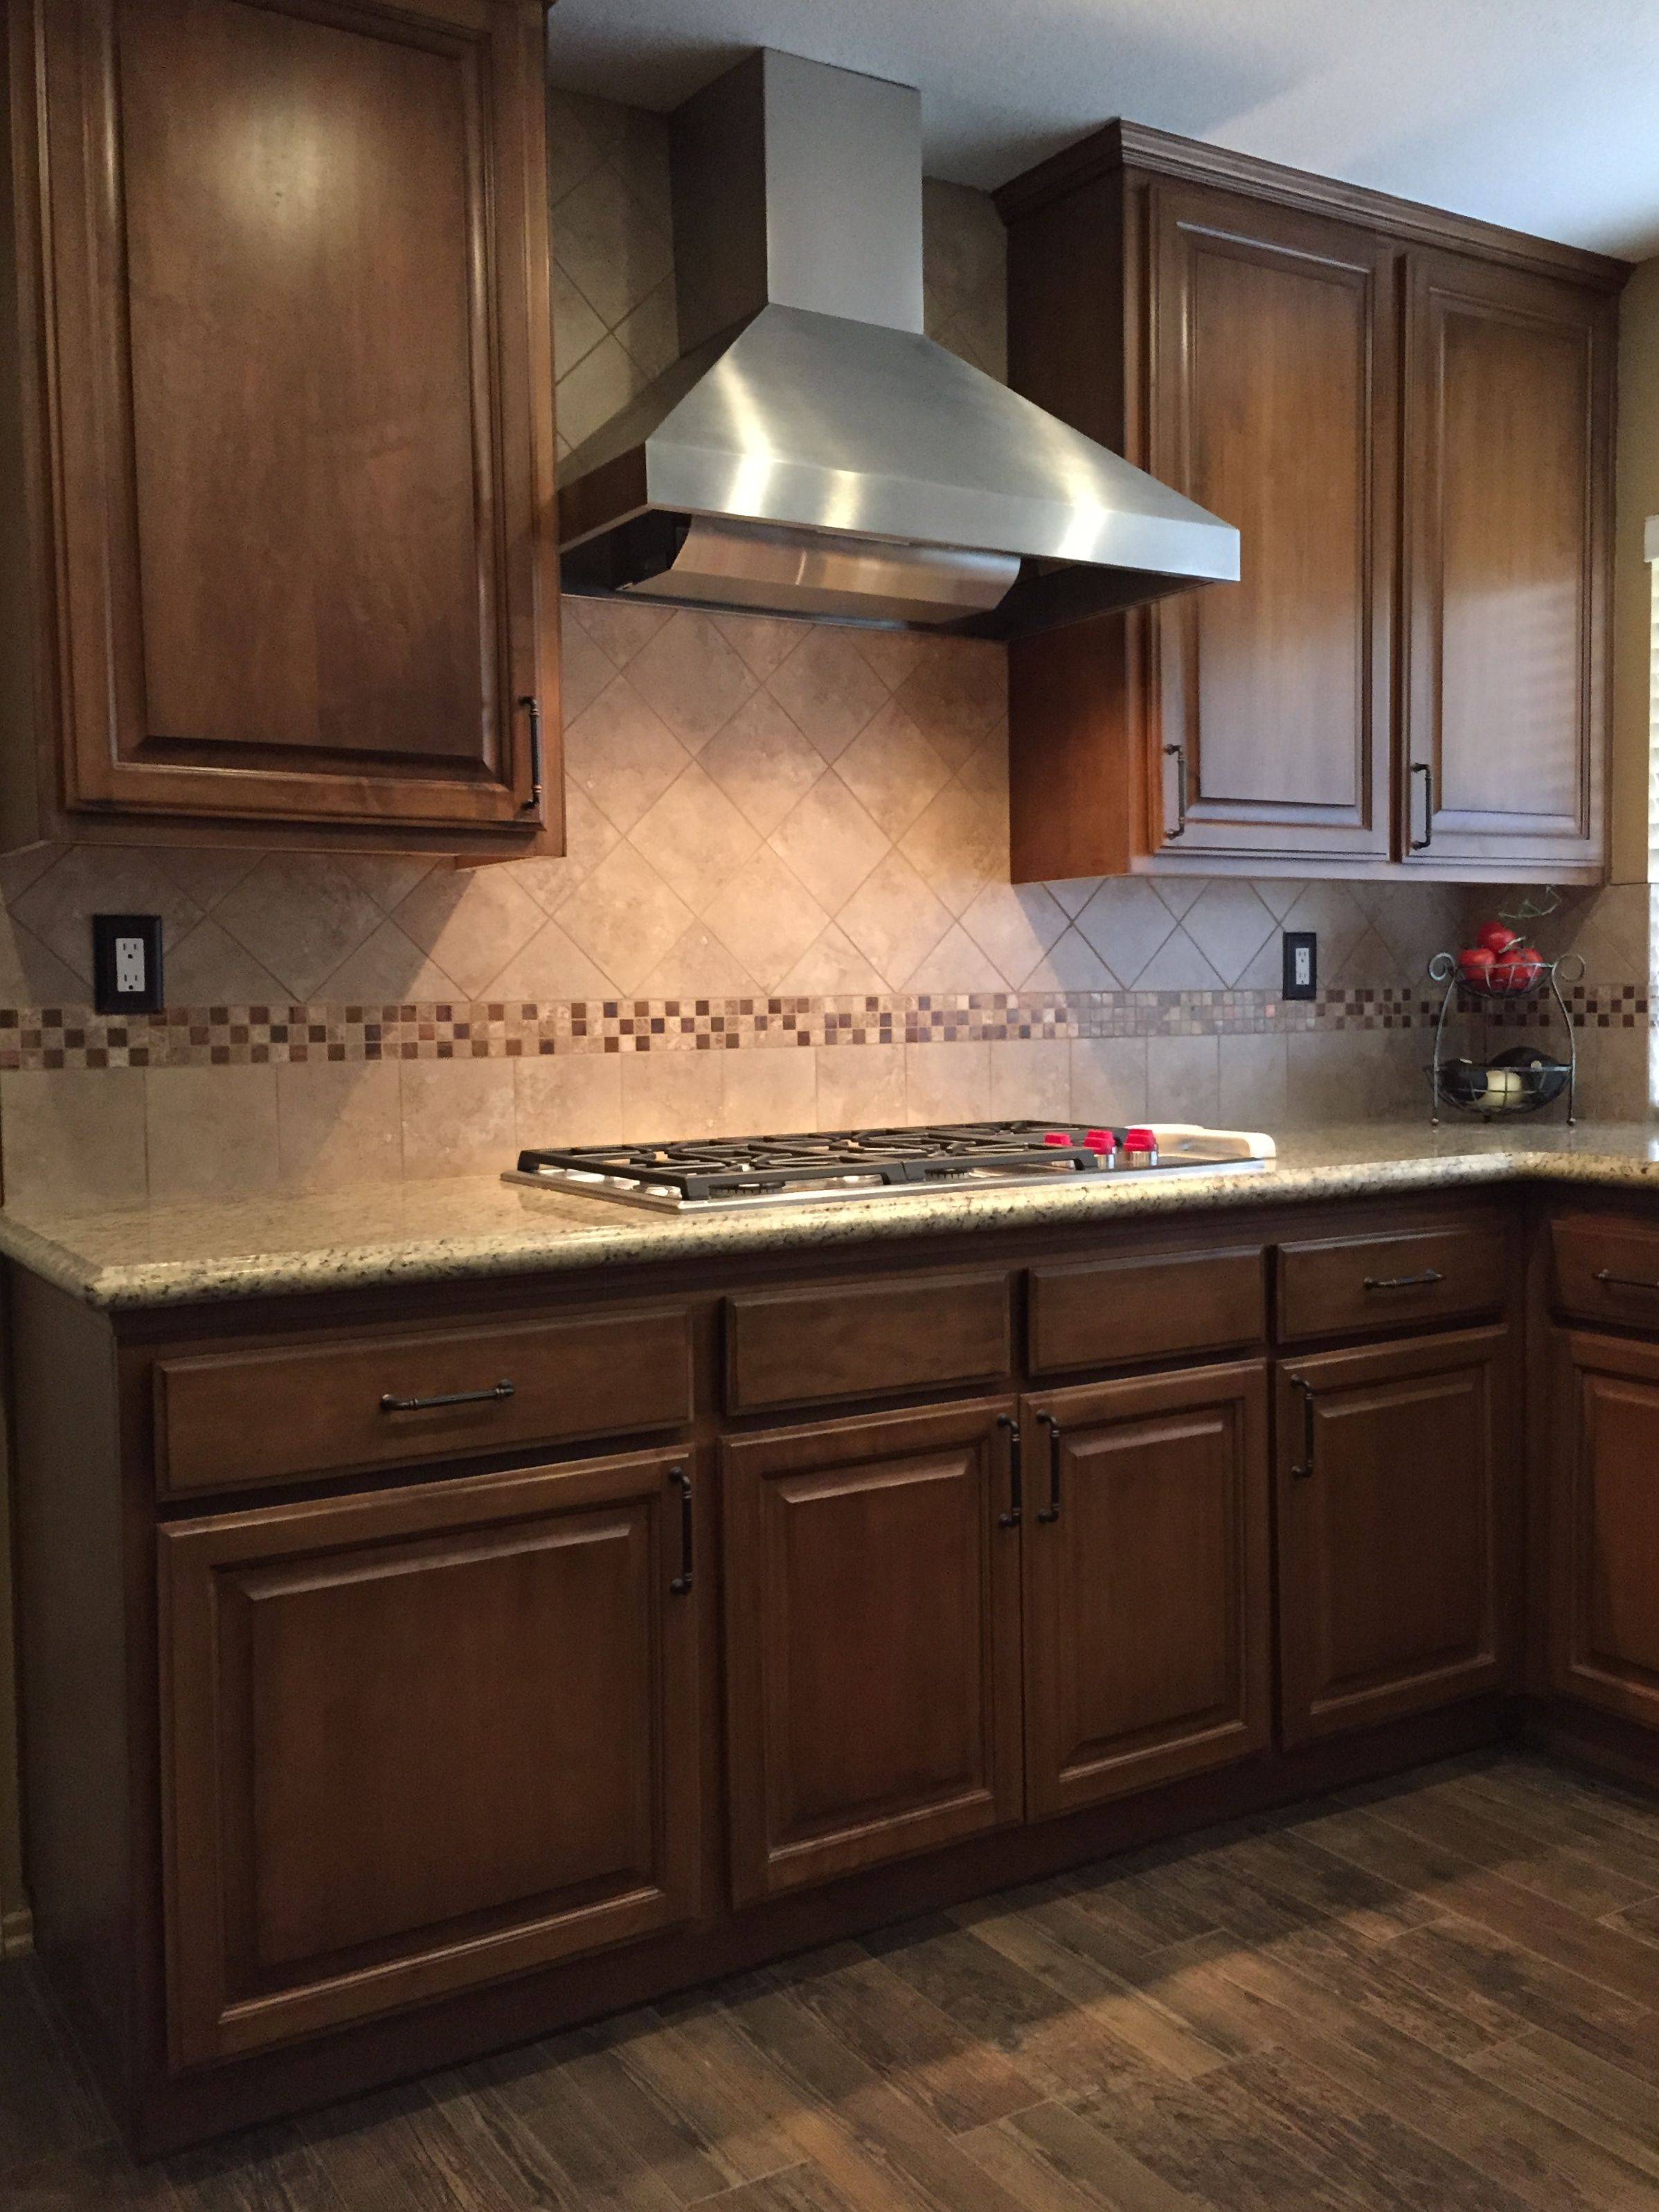 Simi Valley Residence Alicia Paley Home Interiors Kitchen Design Kitchen Interior Kitchen Renovation